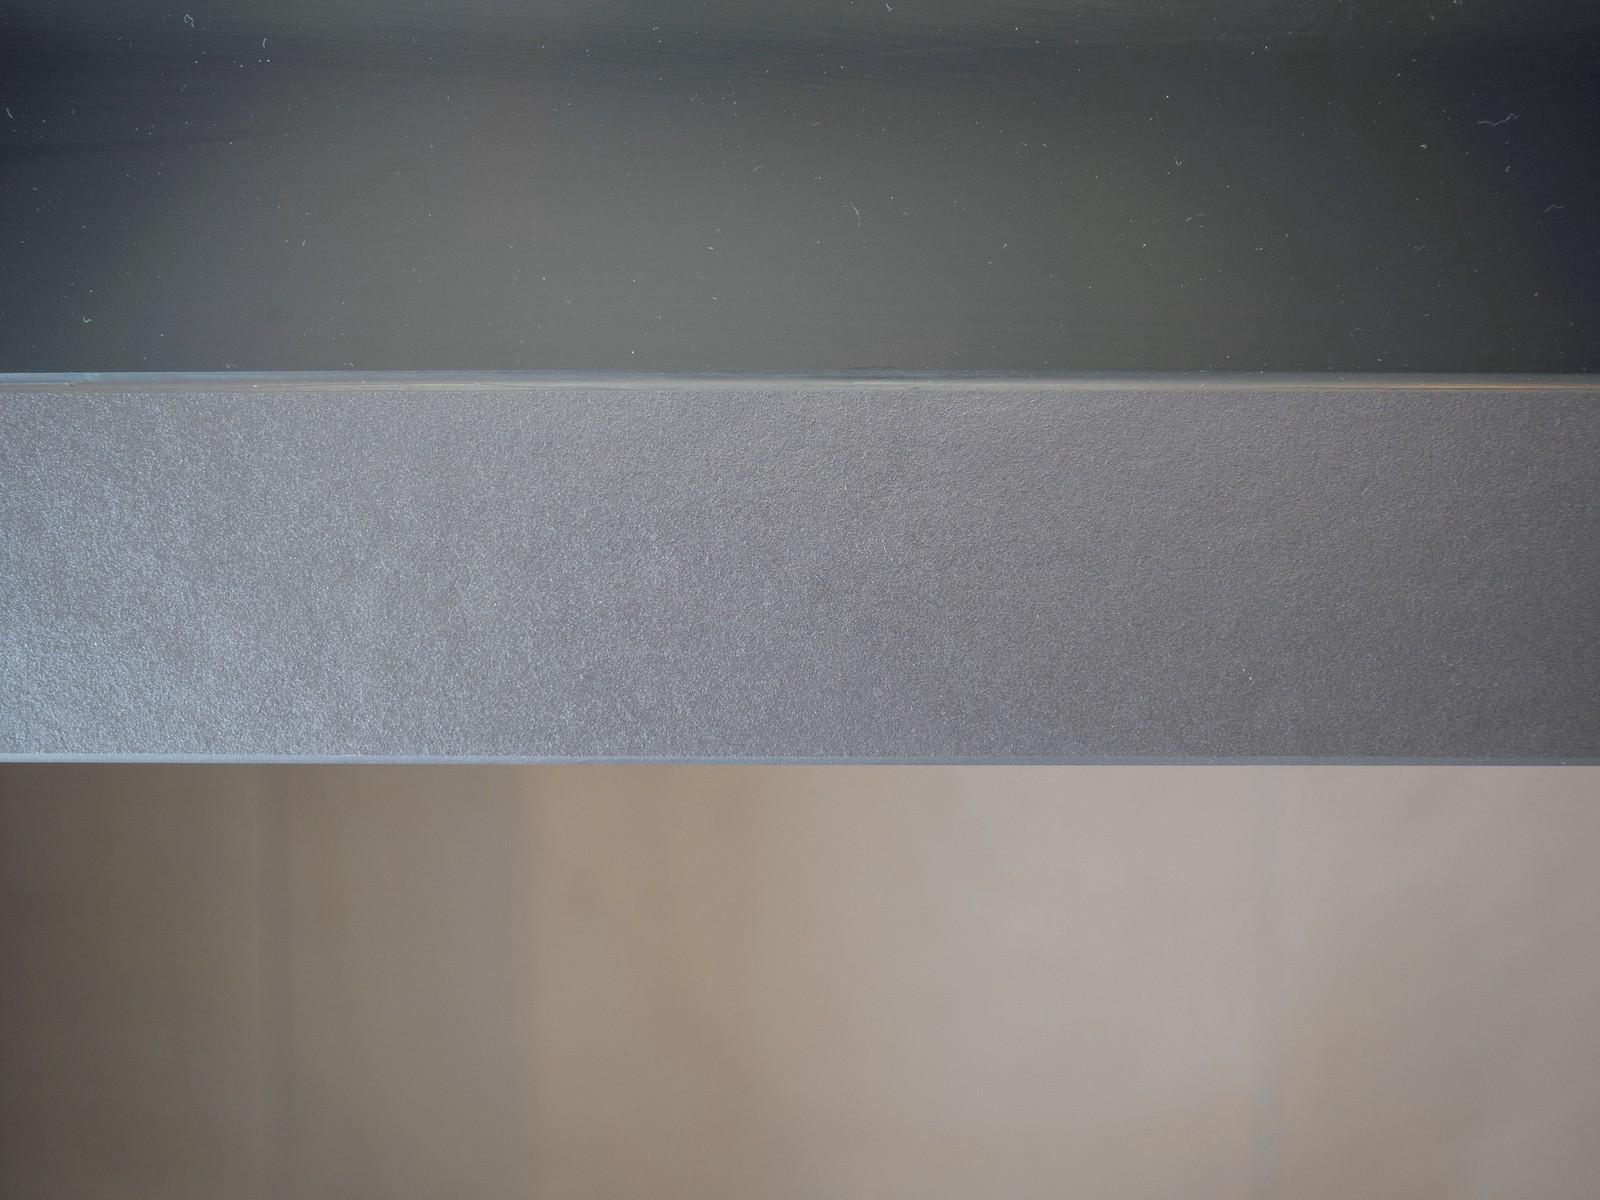 Kueche Exklusiv Design Fronten Holz Furnier Sonnenverbrannt Stahl Keramik Arbeitsplatte Miele 53